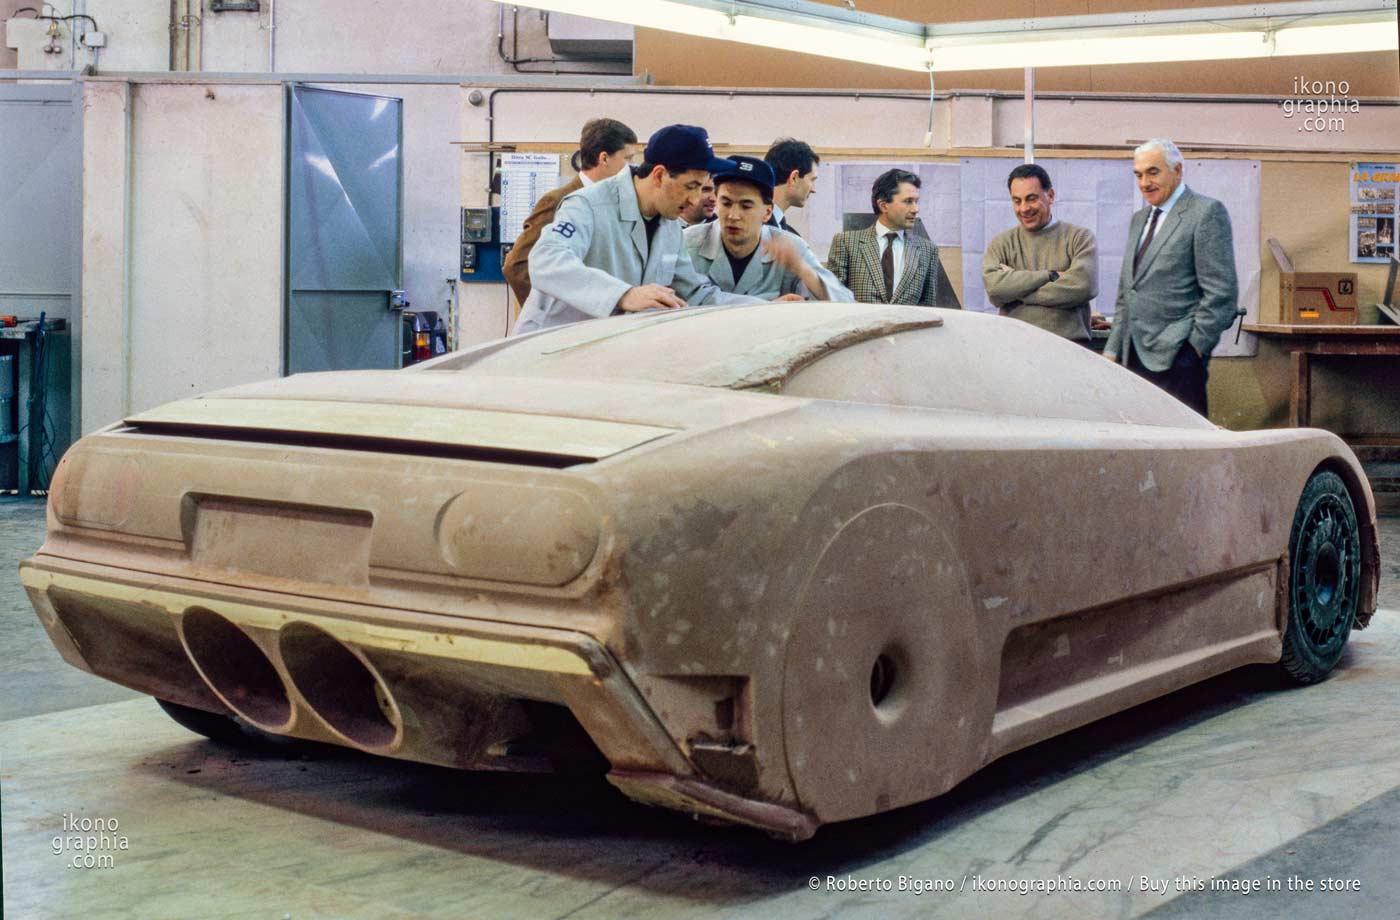 Marcello Gandini, Romano Artioli, and Gianpaolo Benedini heatedly discussing the design with the wooden model of the EB110. Photo by Roberto Bigano. Buy this image in the ikonographia.com store.